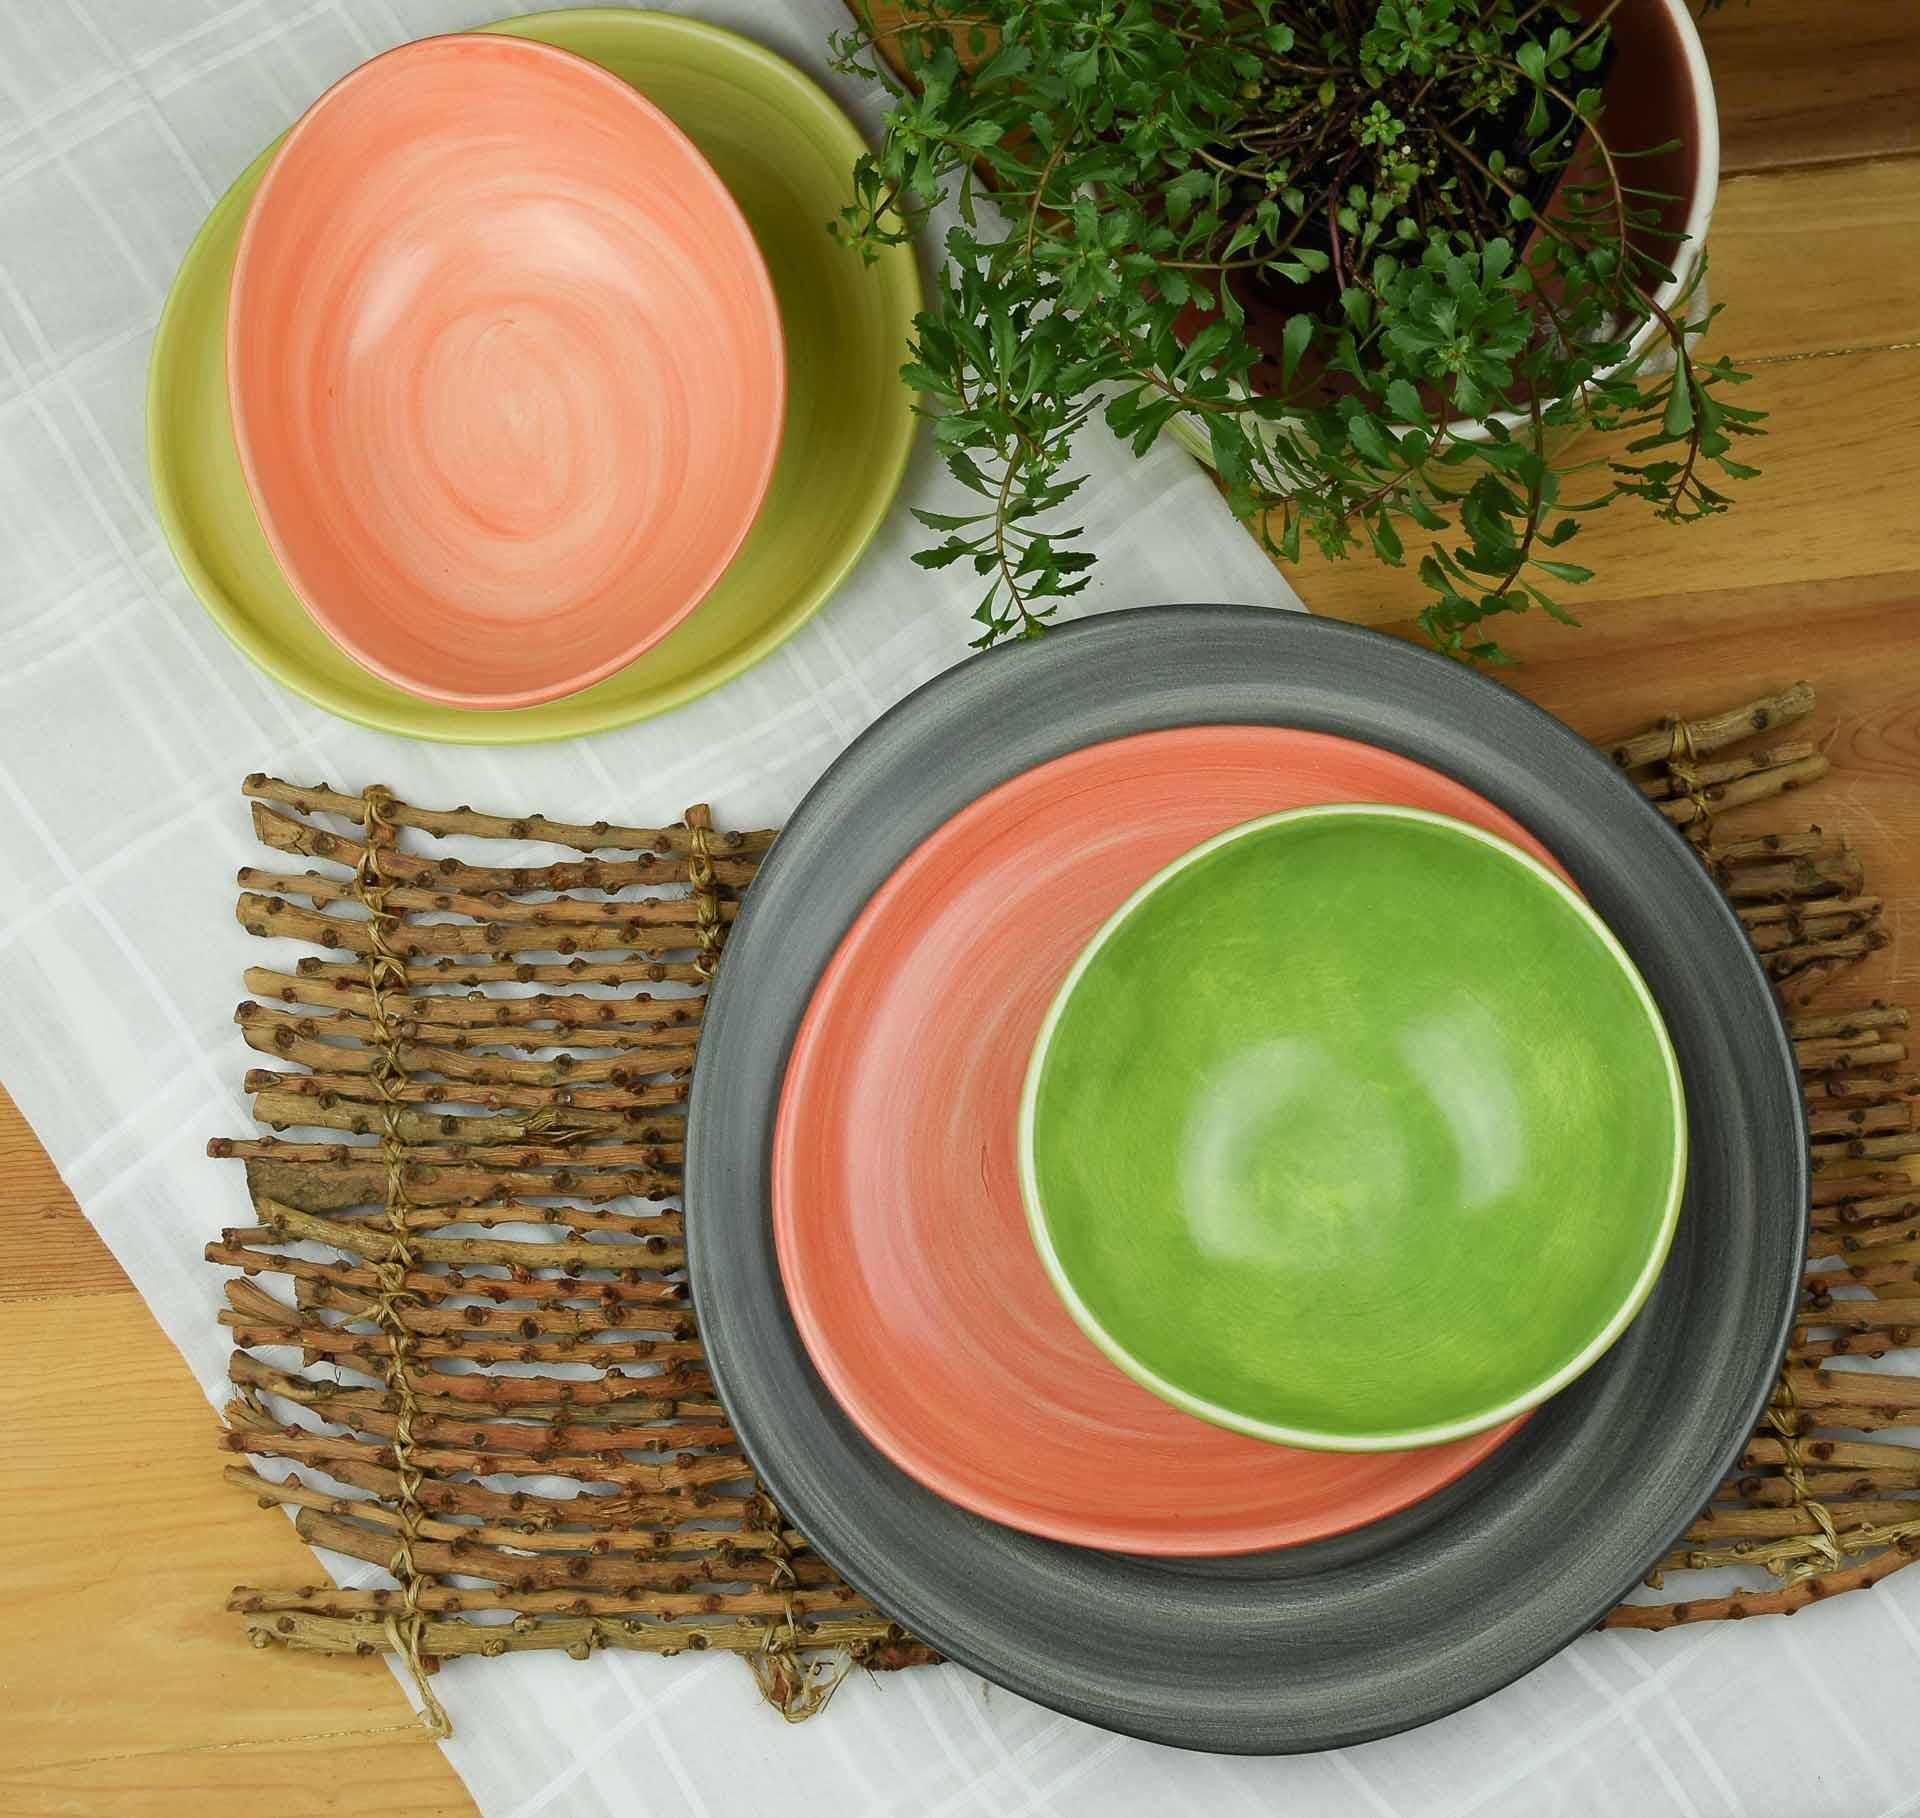 Melanie Thompson Artware Fine Ceramic Artware Handmade in Oregon the best artware for your table softness soft ceramics-8.jpg